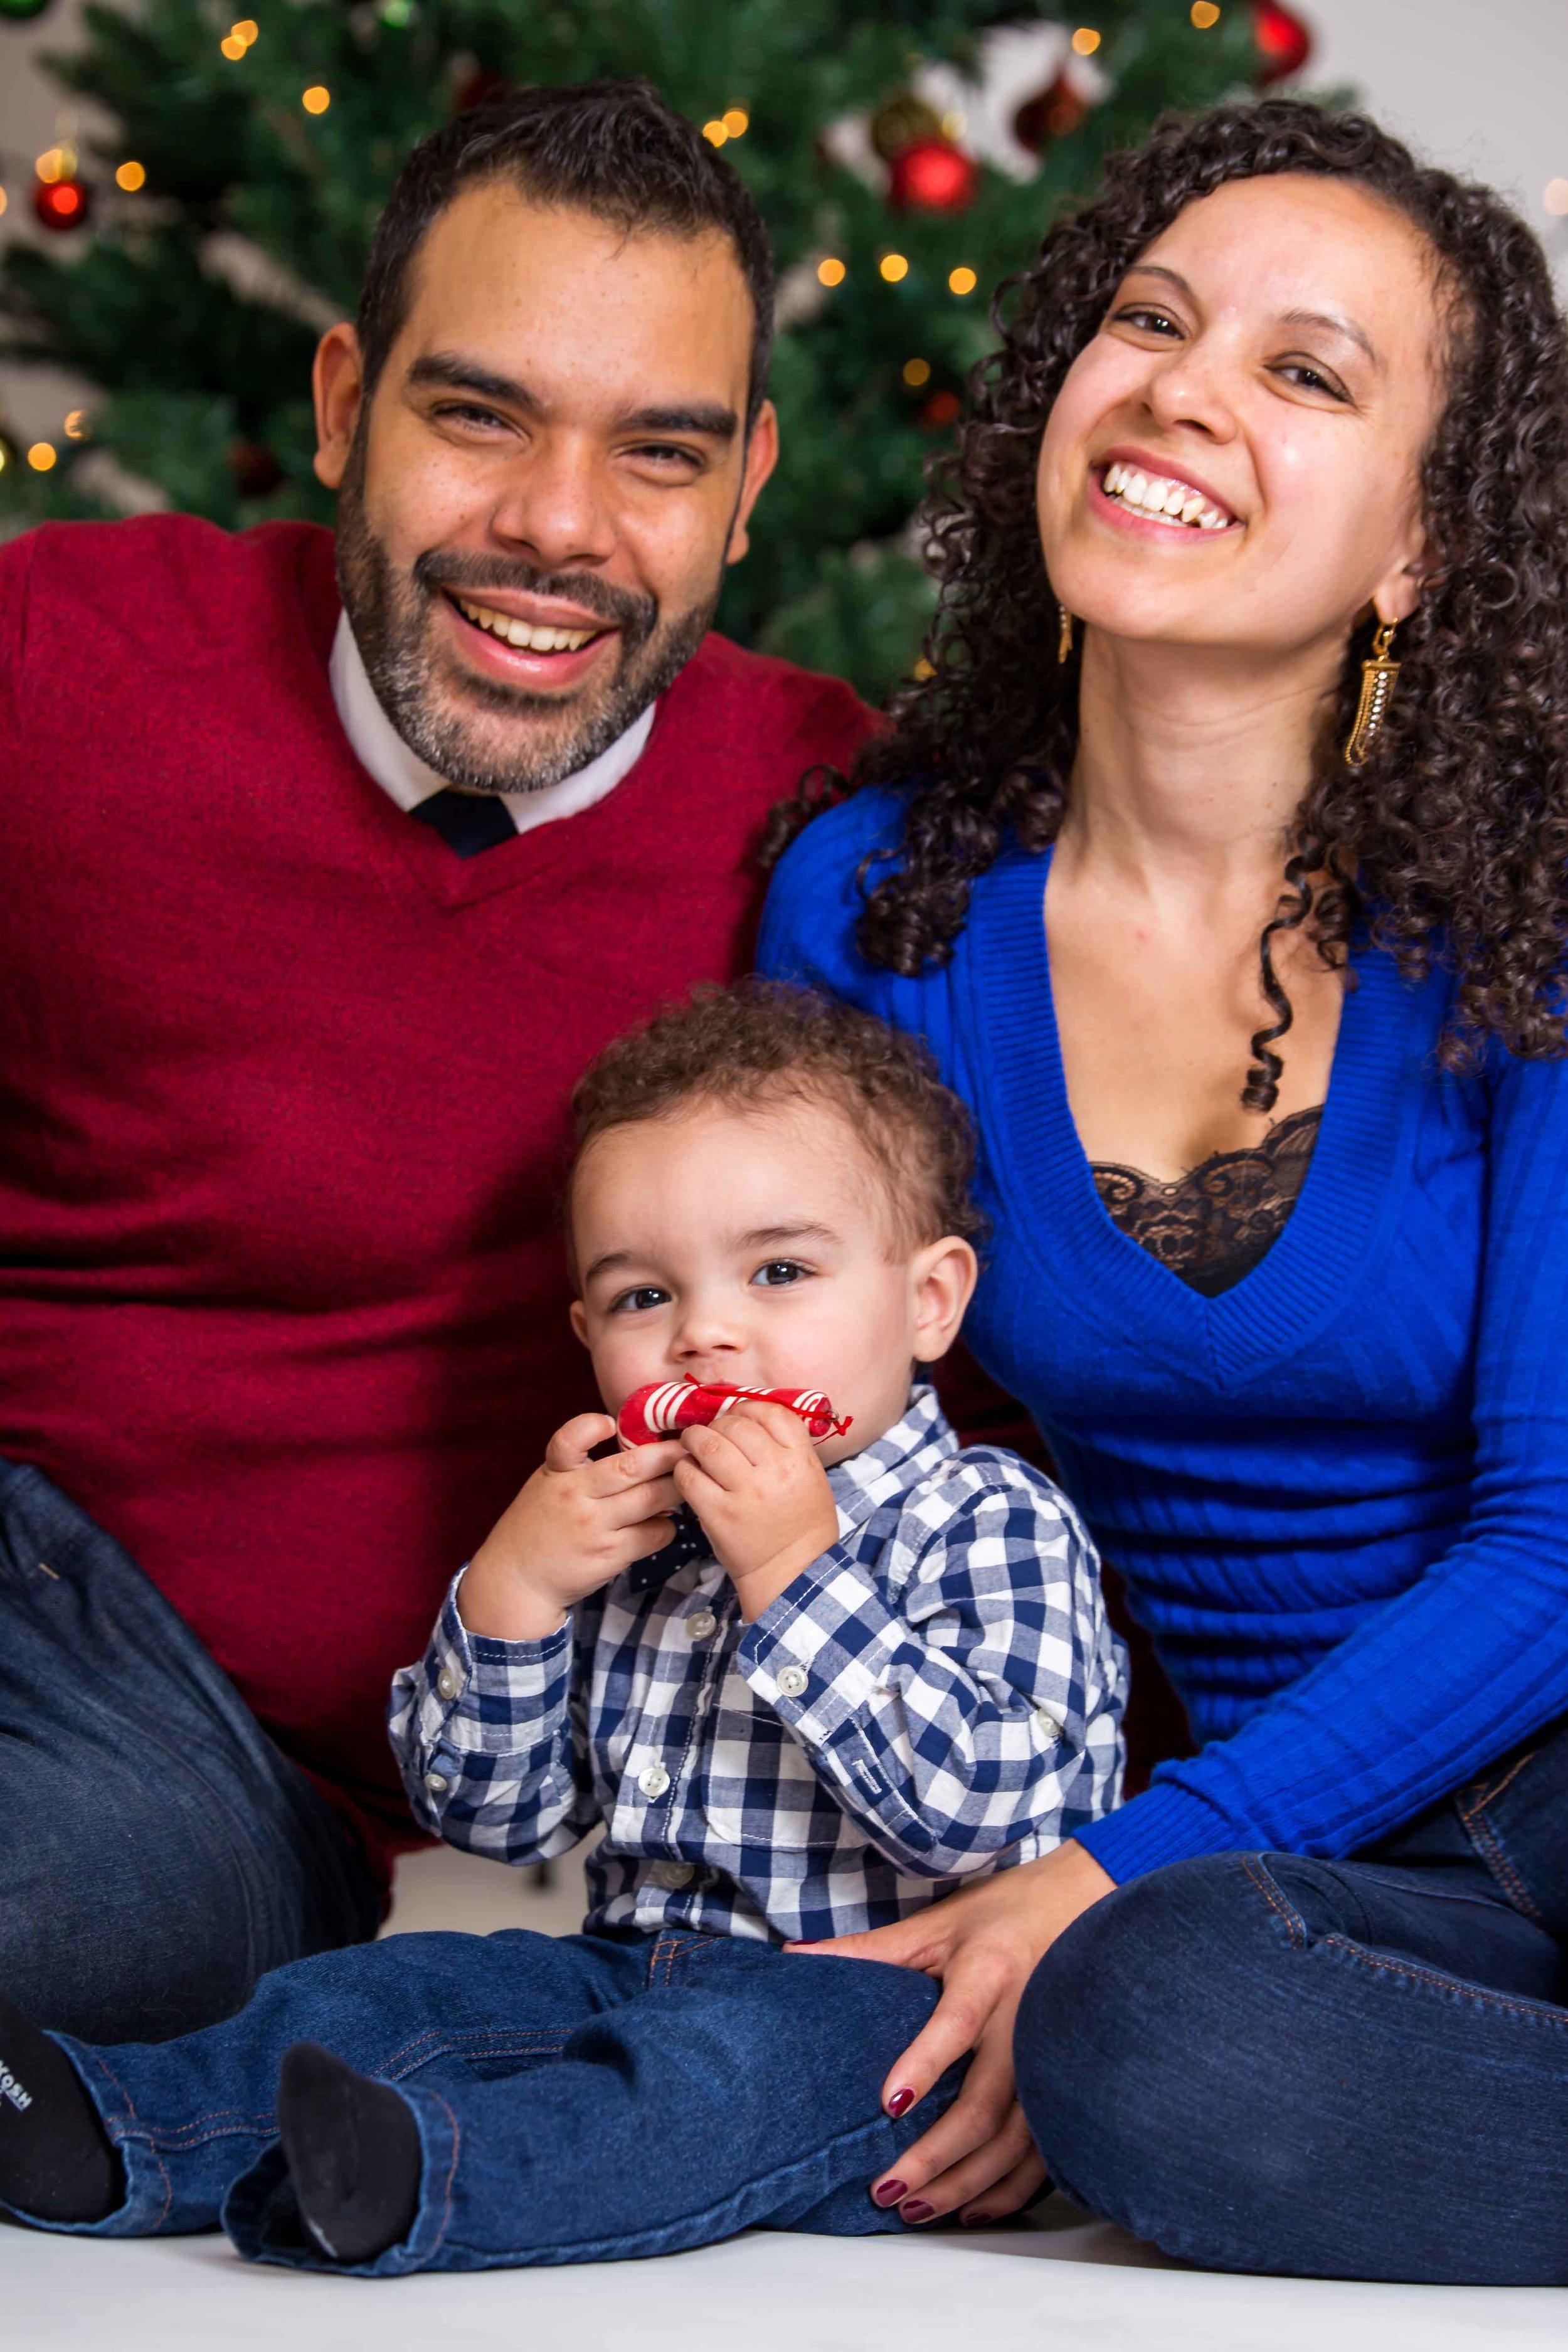 Nyc-holiday-photographs-photographer-family-21.jpg